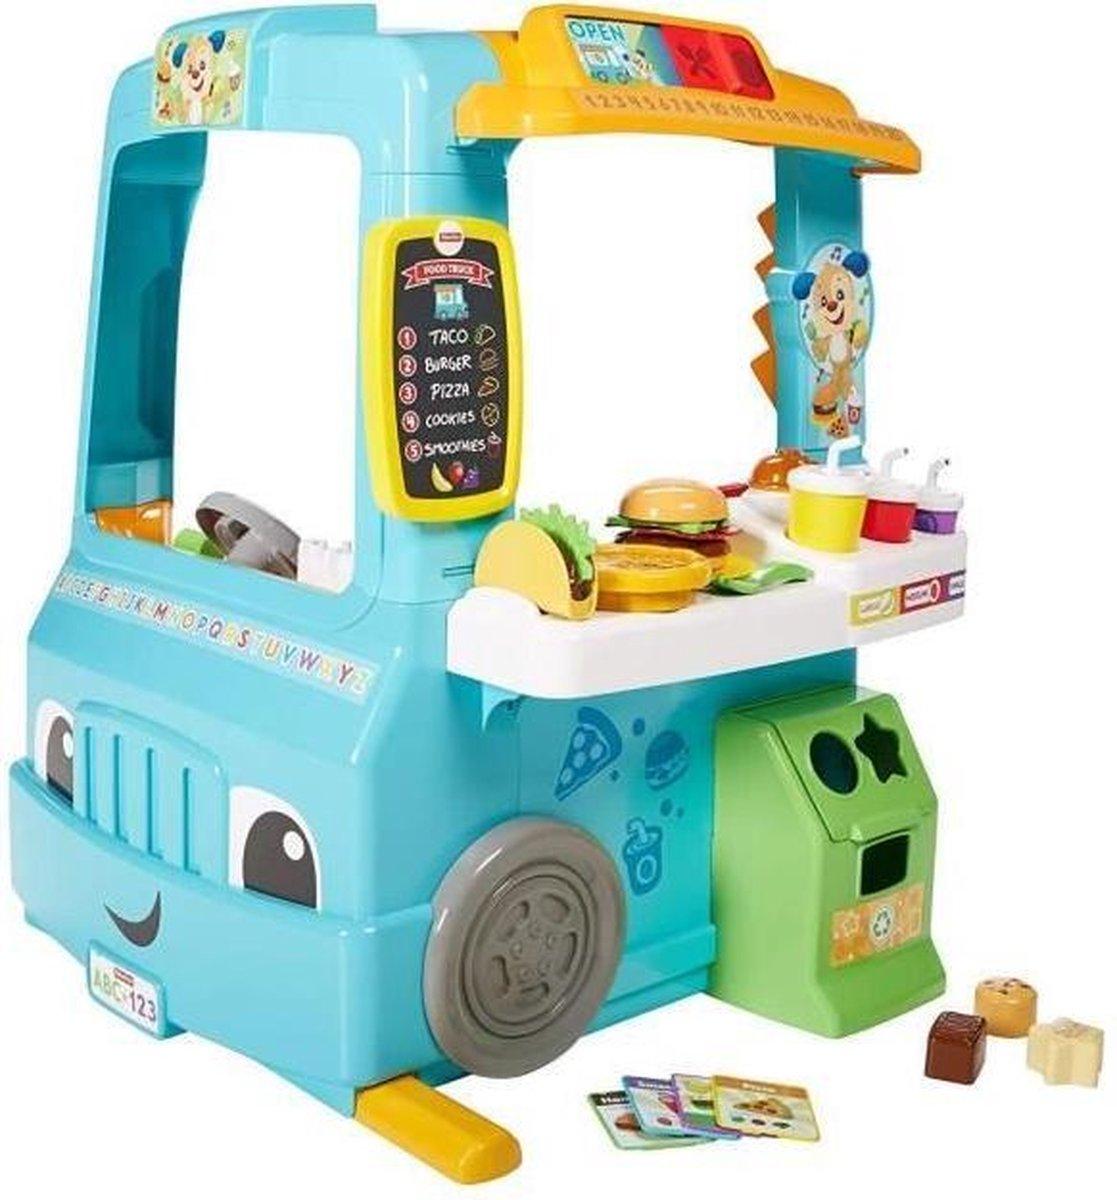 Fisher-Price GHJ07 speelgoedset